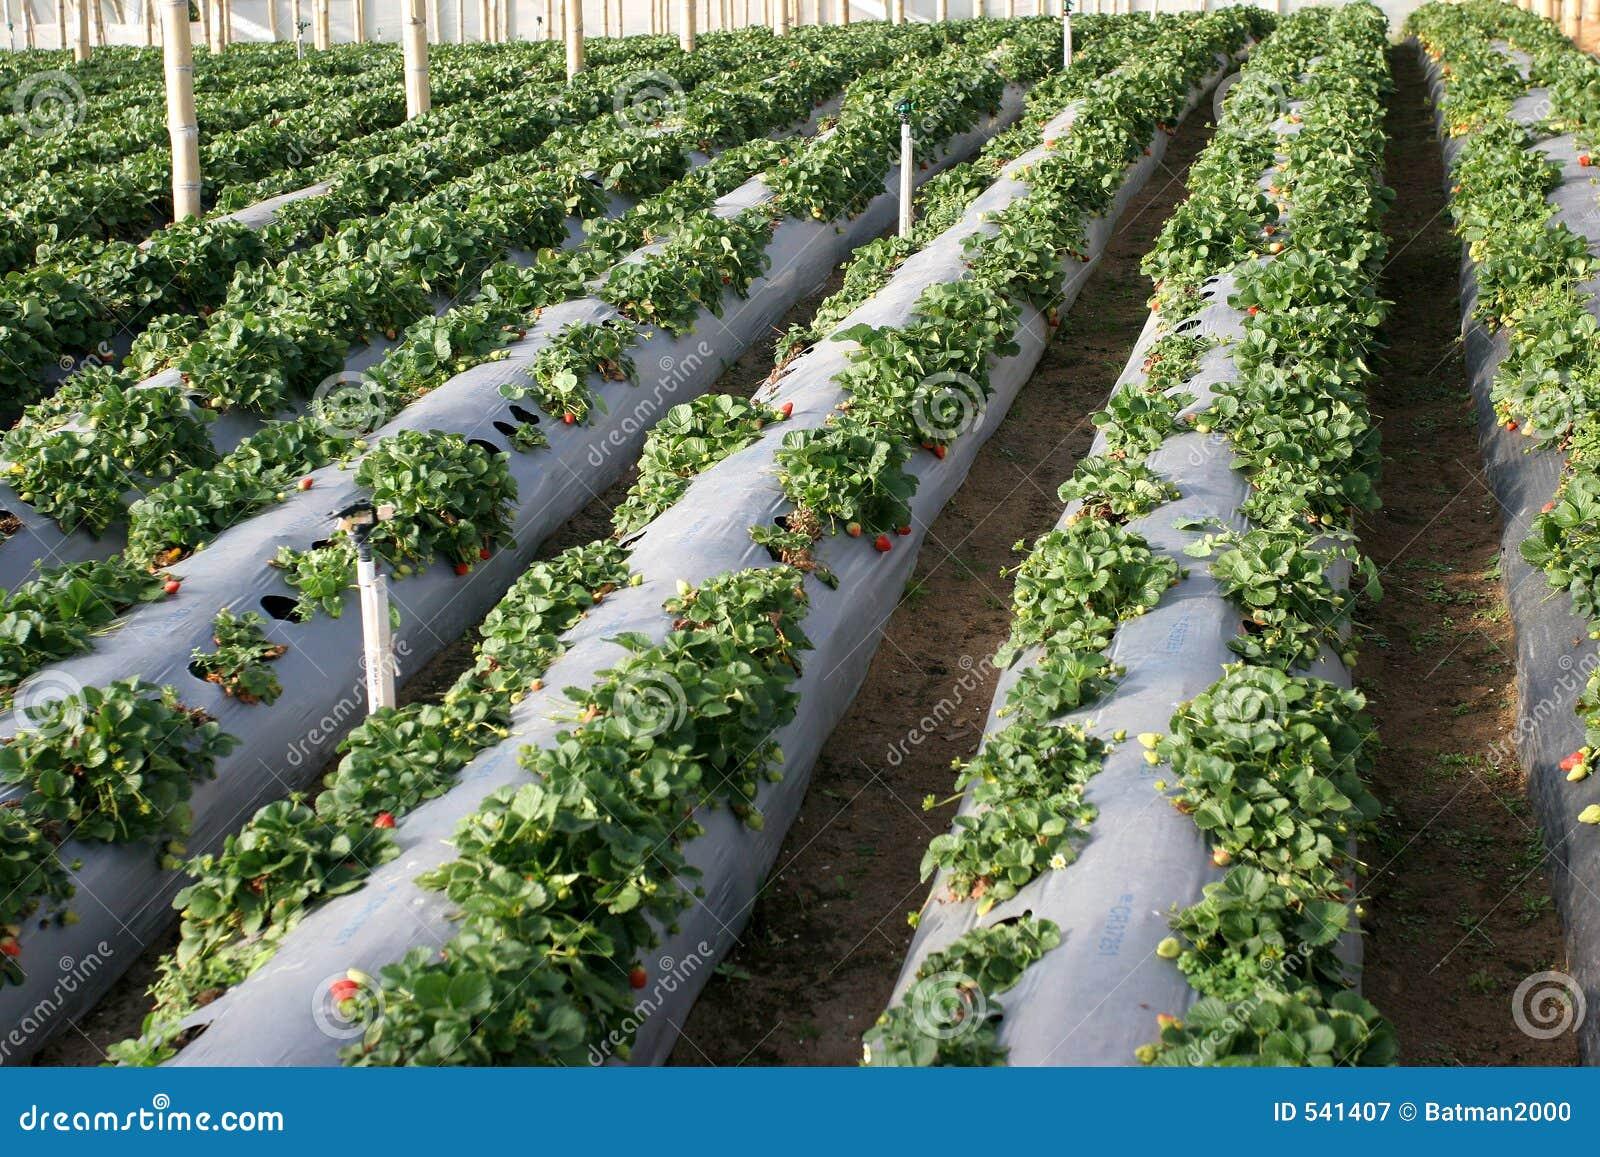 Download 农业草莓 库存图片. 图片 包括有 营养, homesteading的, 搜集, 施肥, 水栽法, 运行, 地产 - 541407